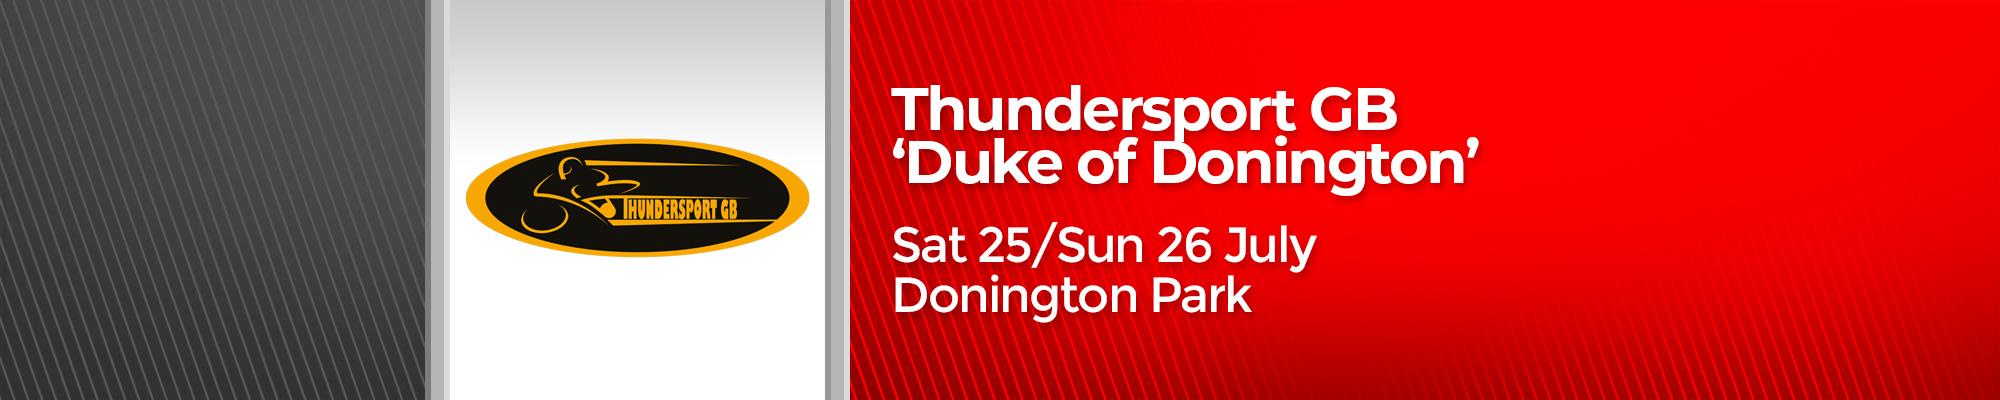 Thundersport GB - Duke of Donington